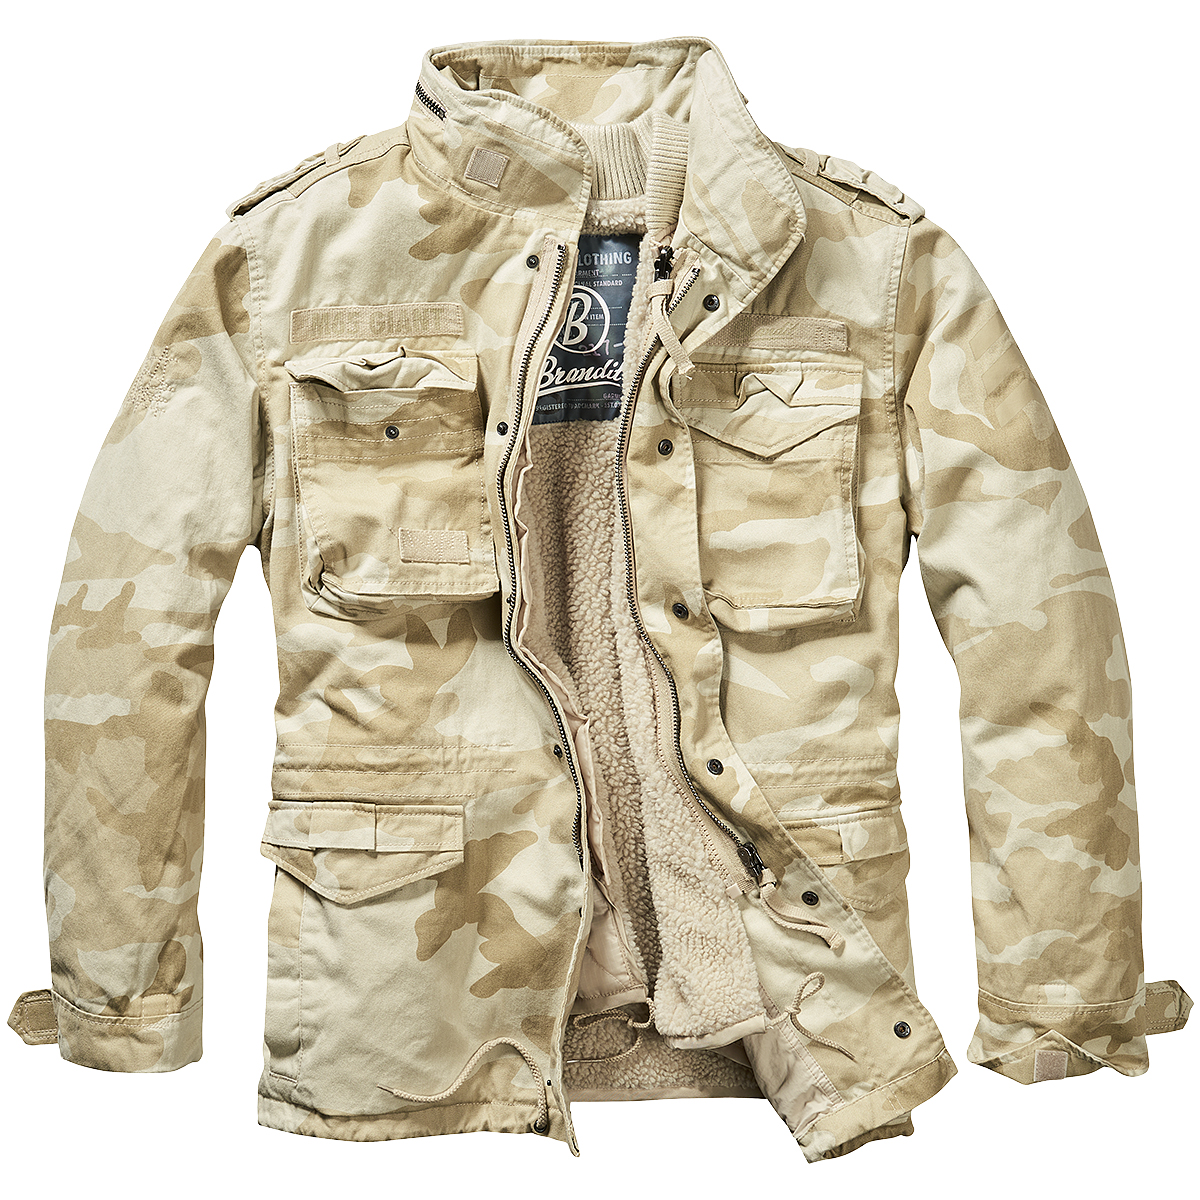 Details about Brandit M 65 Giant Jacket Military Tactical Mens Warm Field Parka Sandstorm Camo